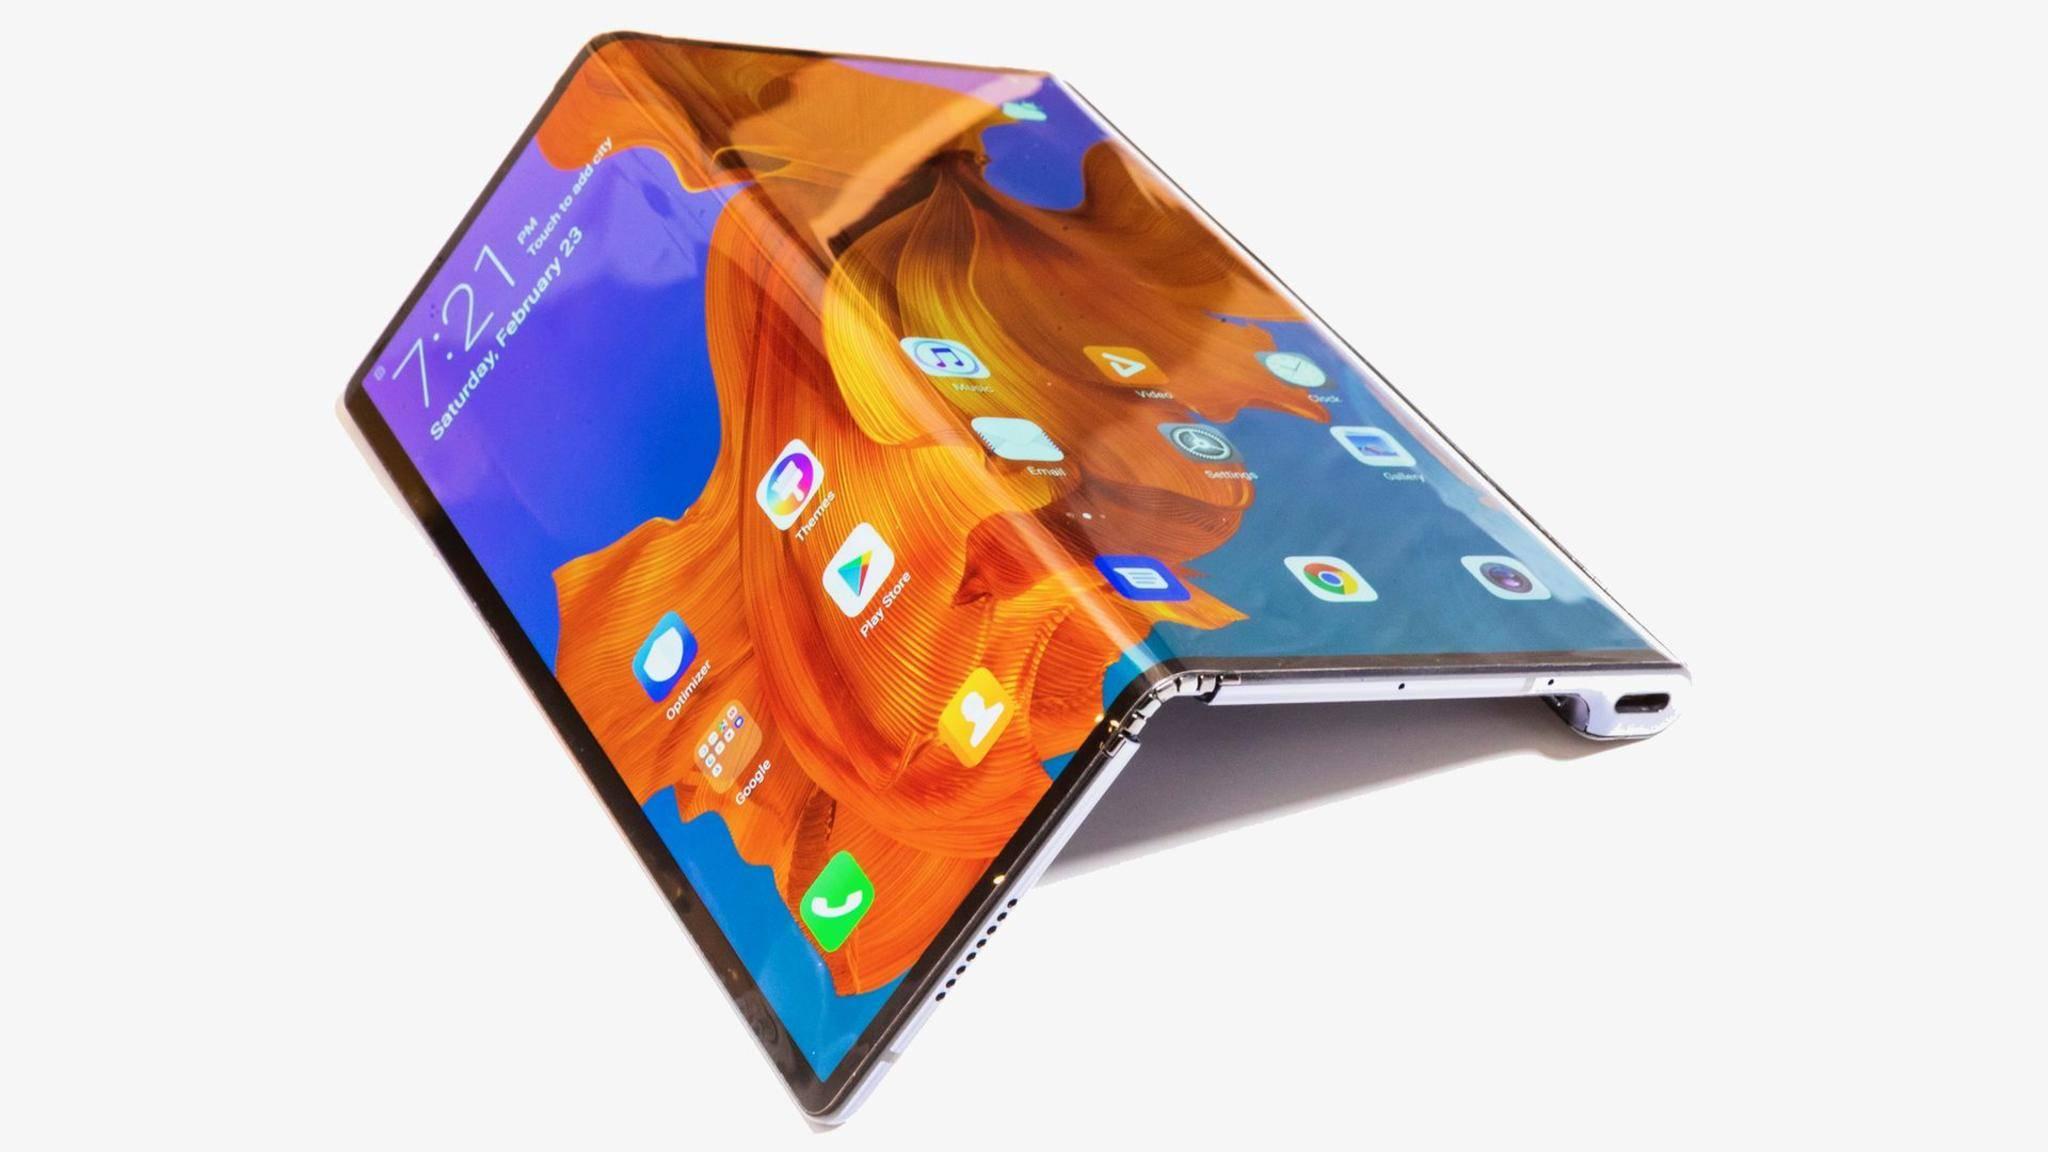 Das nächste Galaxy Fold soll am Design des Huawei Mate X angelehnt sein.